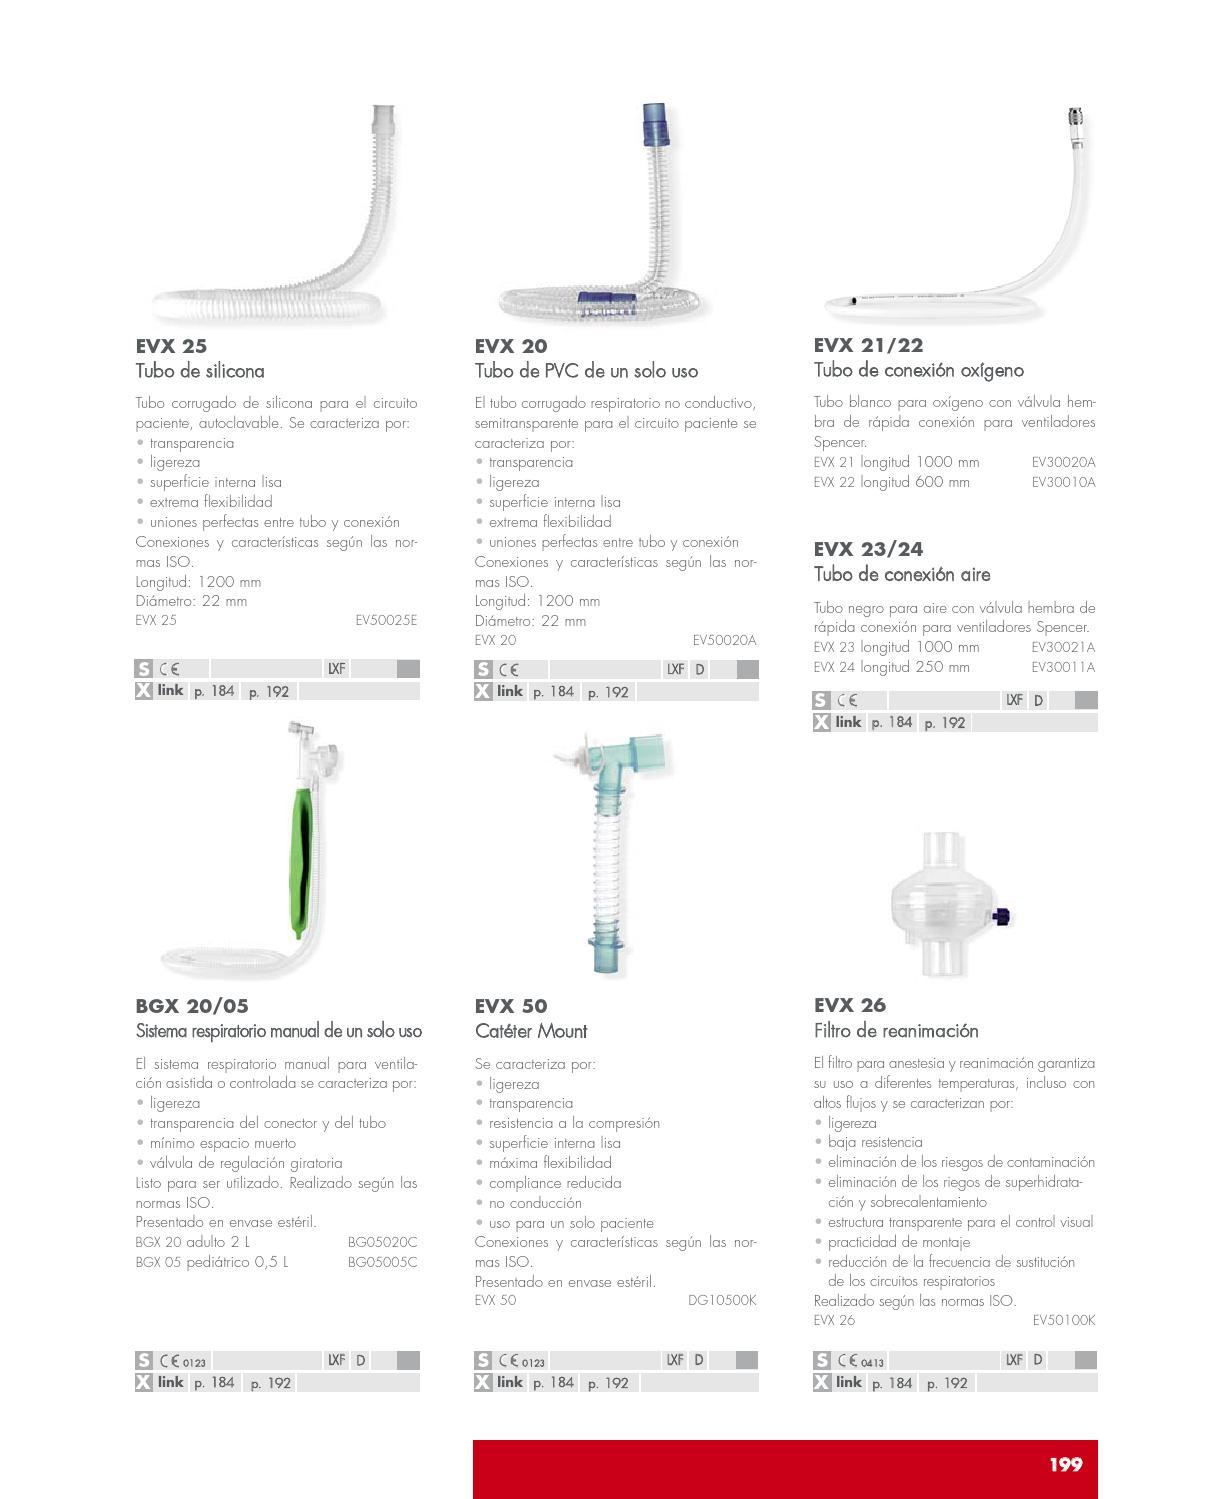 EBTOOLS Cubierta del respiradero del cap/ó del ABS Impresi/ón de transferencia hidrogr/áfica accesorio modificado del respiradero del cap/ó del ABS del autom/óvil para Focus RS MK2